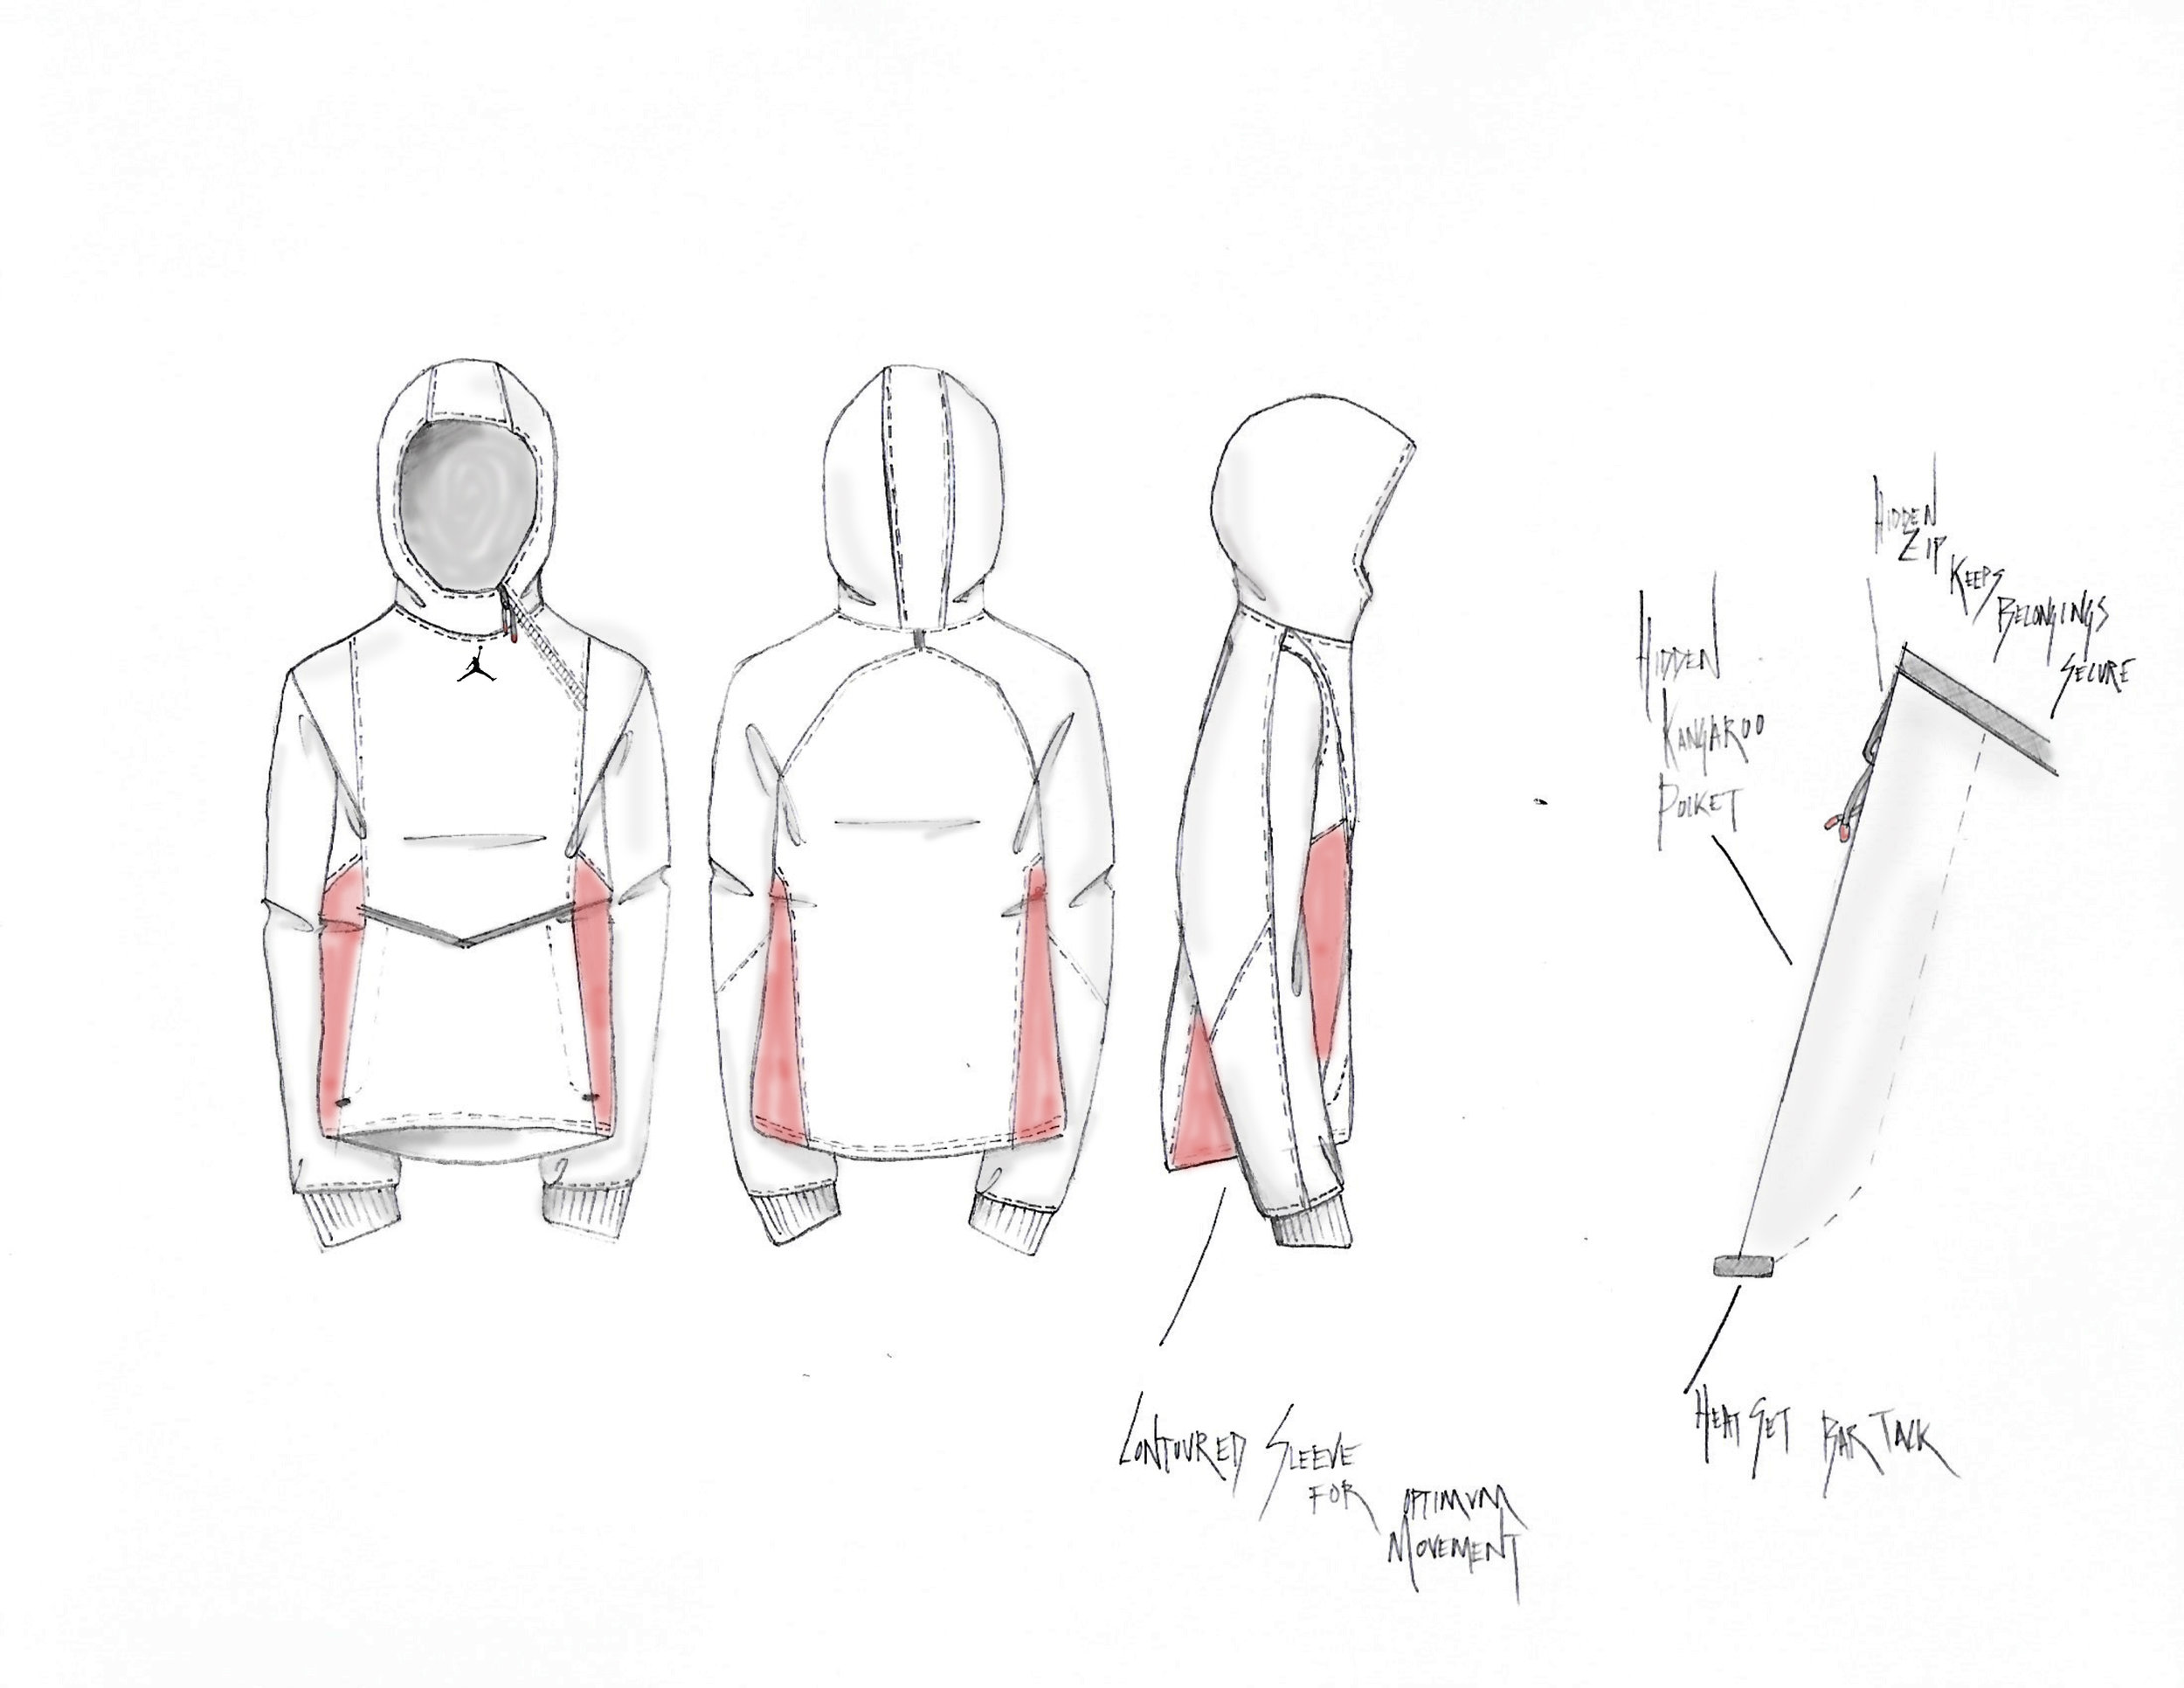 jordan-sketches-1-4.jpg